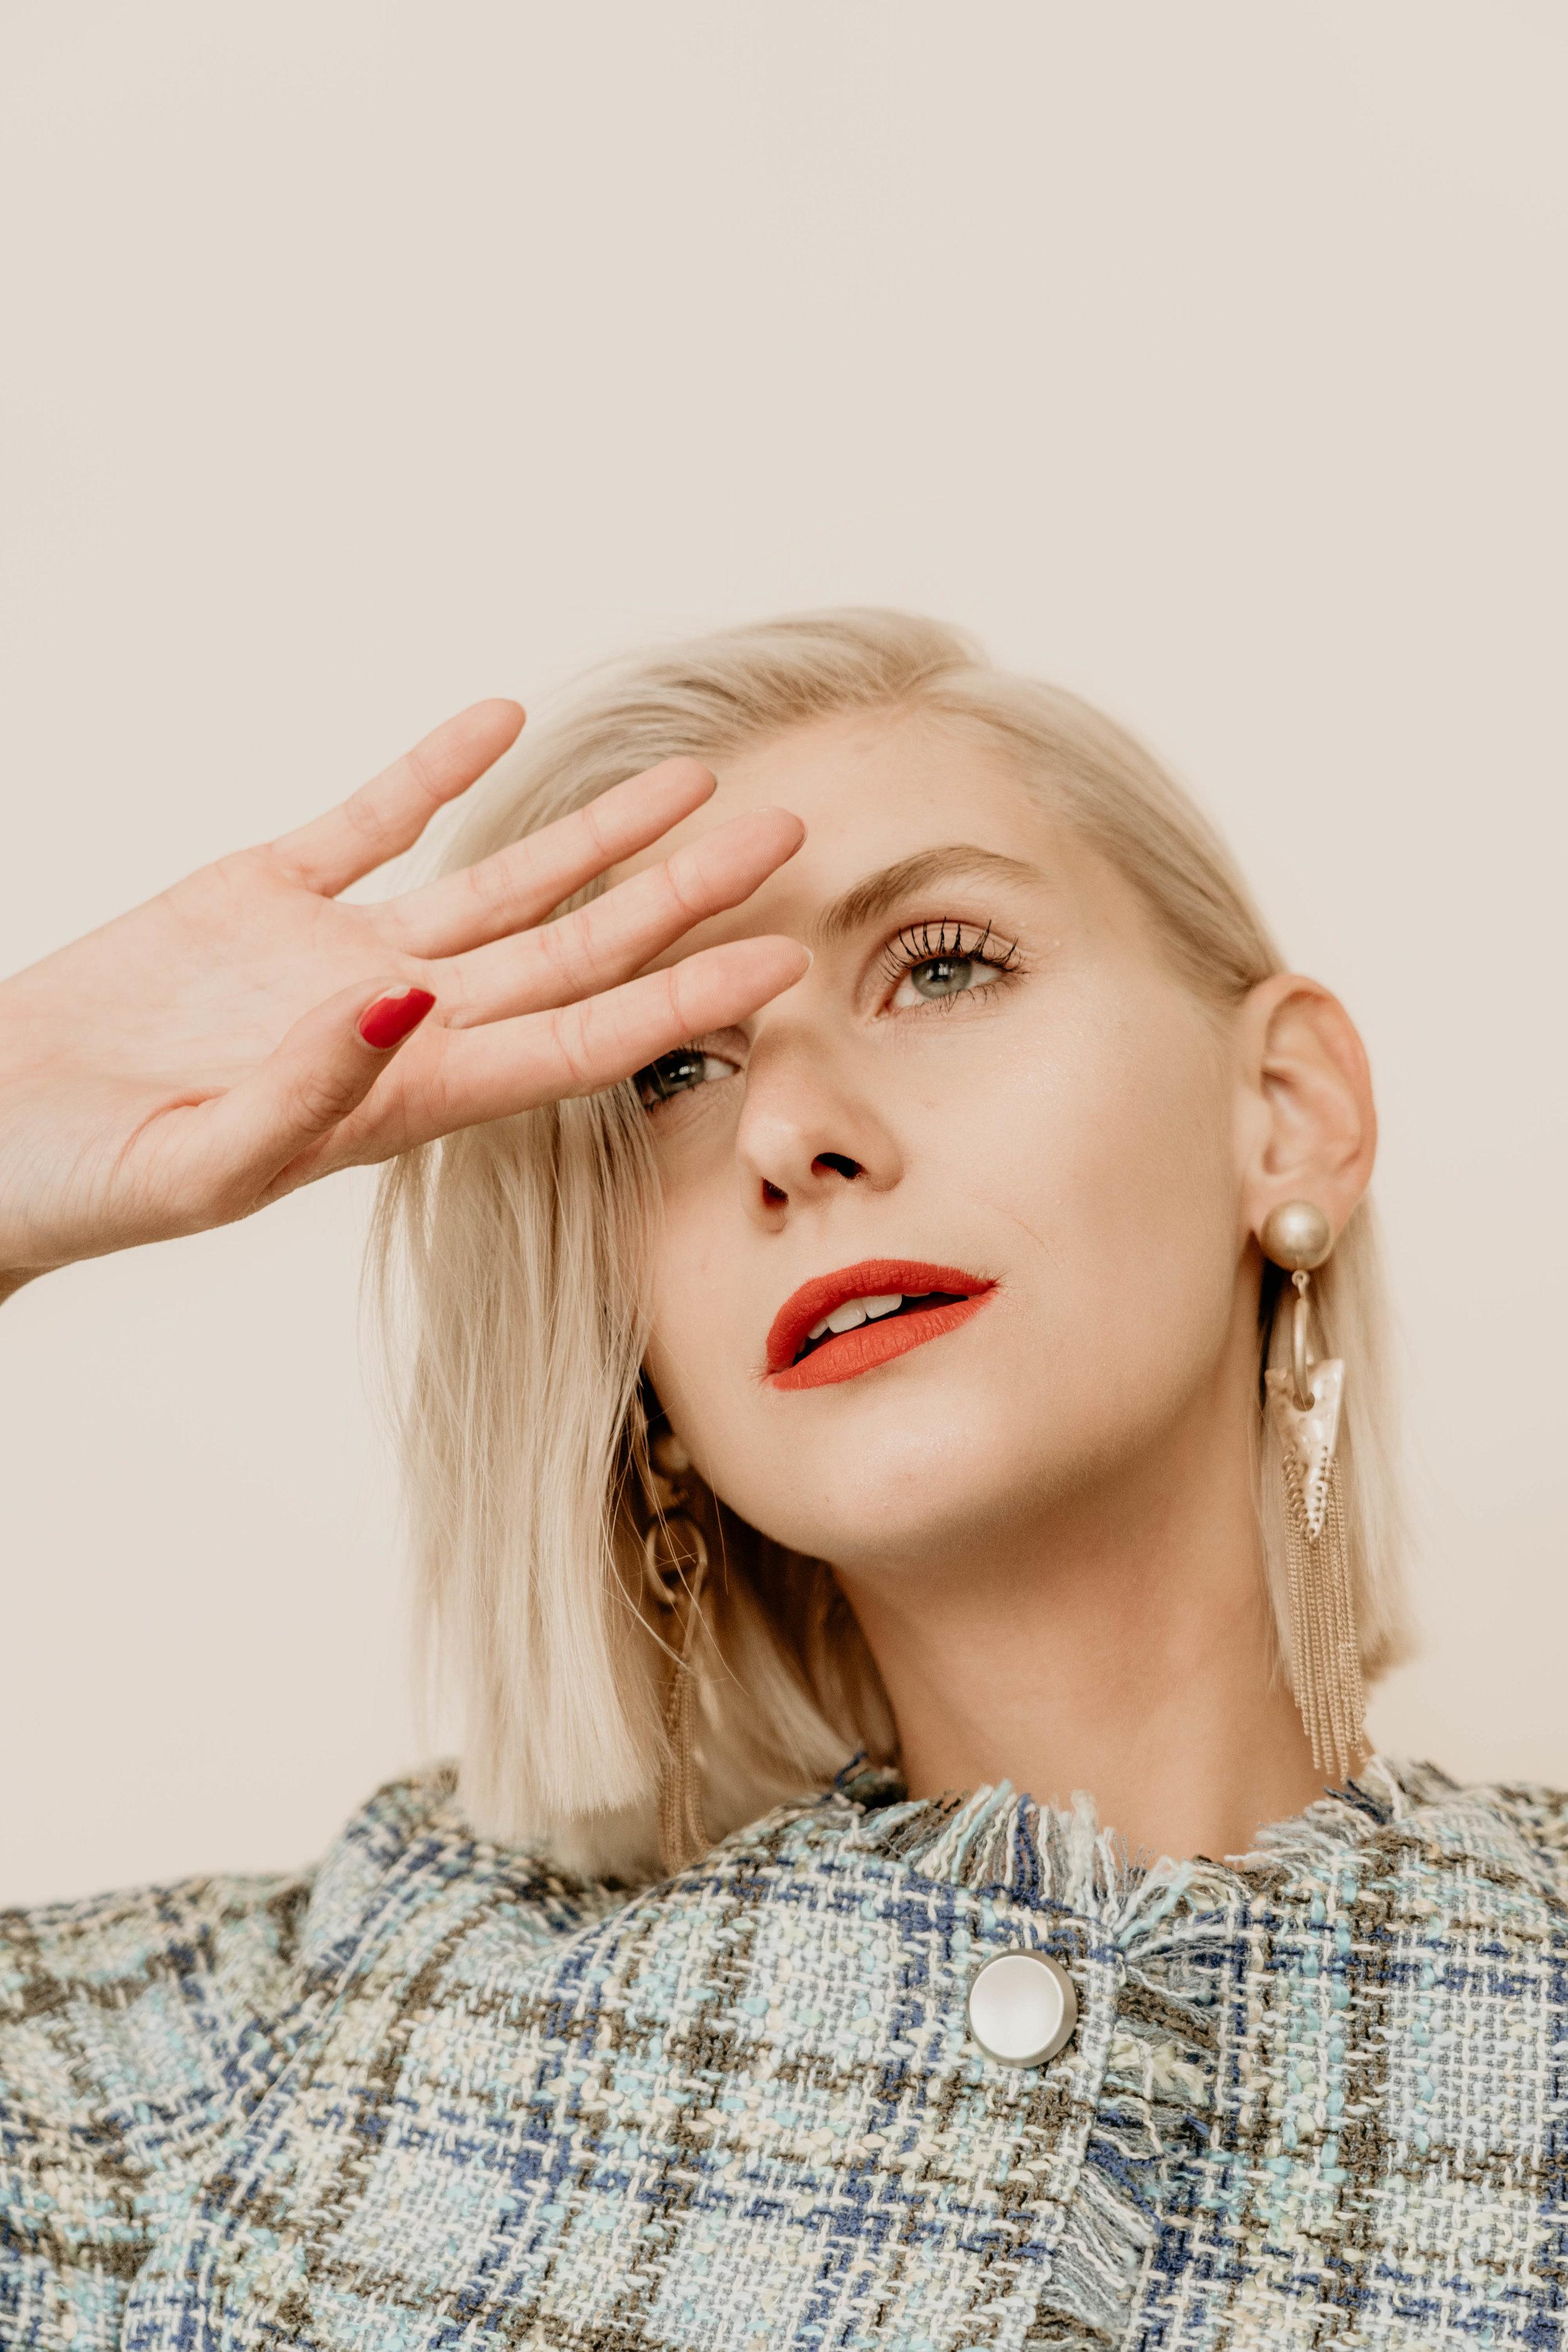 Kimyana Hachmann - Coordination Management Social Media Kooperation mit Shiseido x Emotion.Award 2019Photo by Carolin Lauffenburger